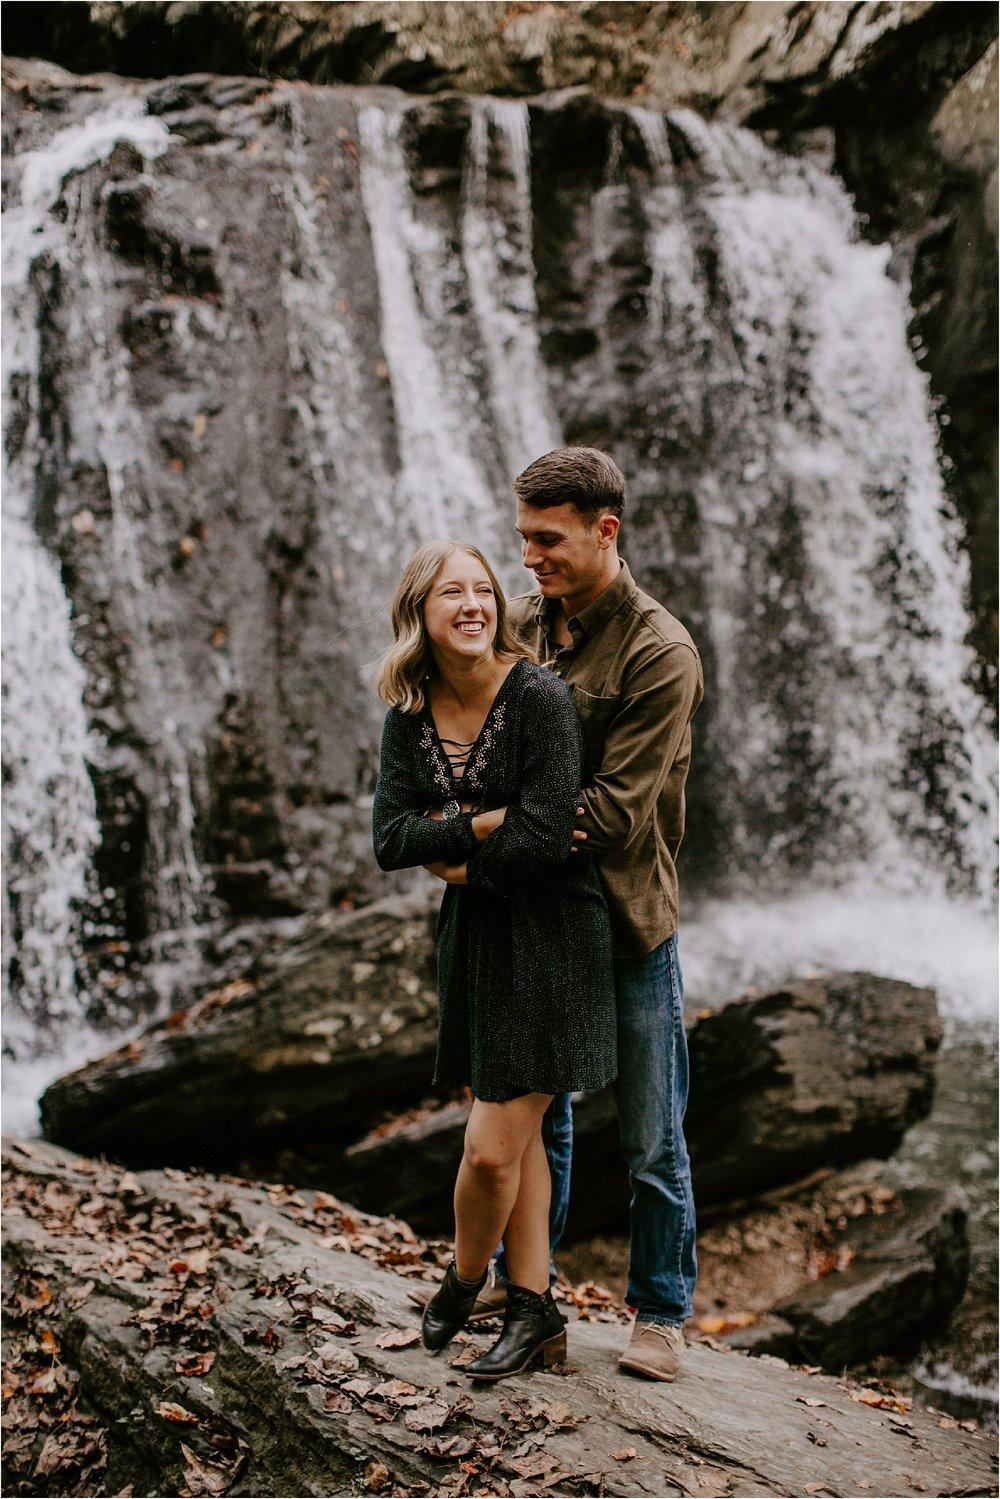 Sarah_Brookhart_PA_MD_Wedding_Photographer_0006.jpg